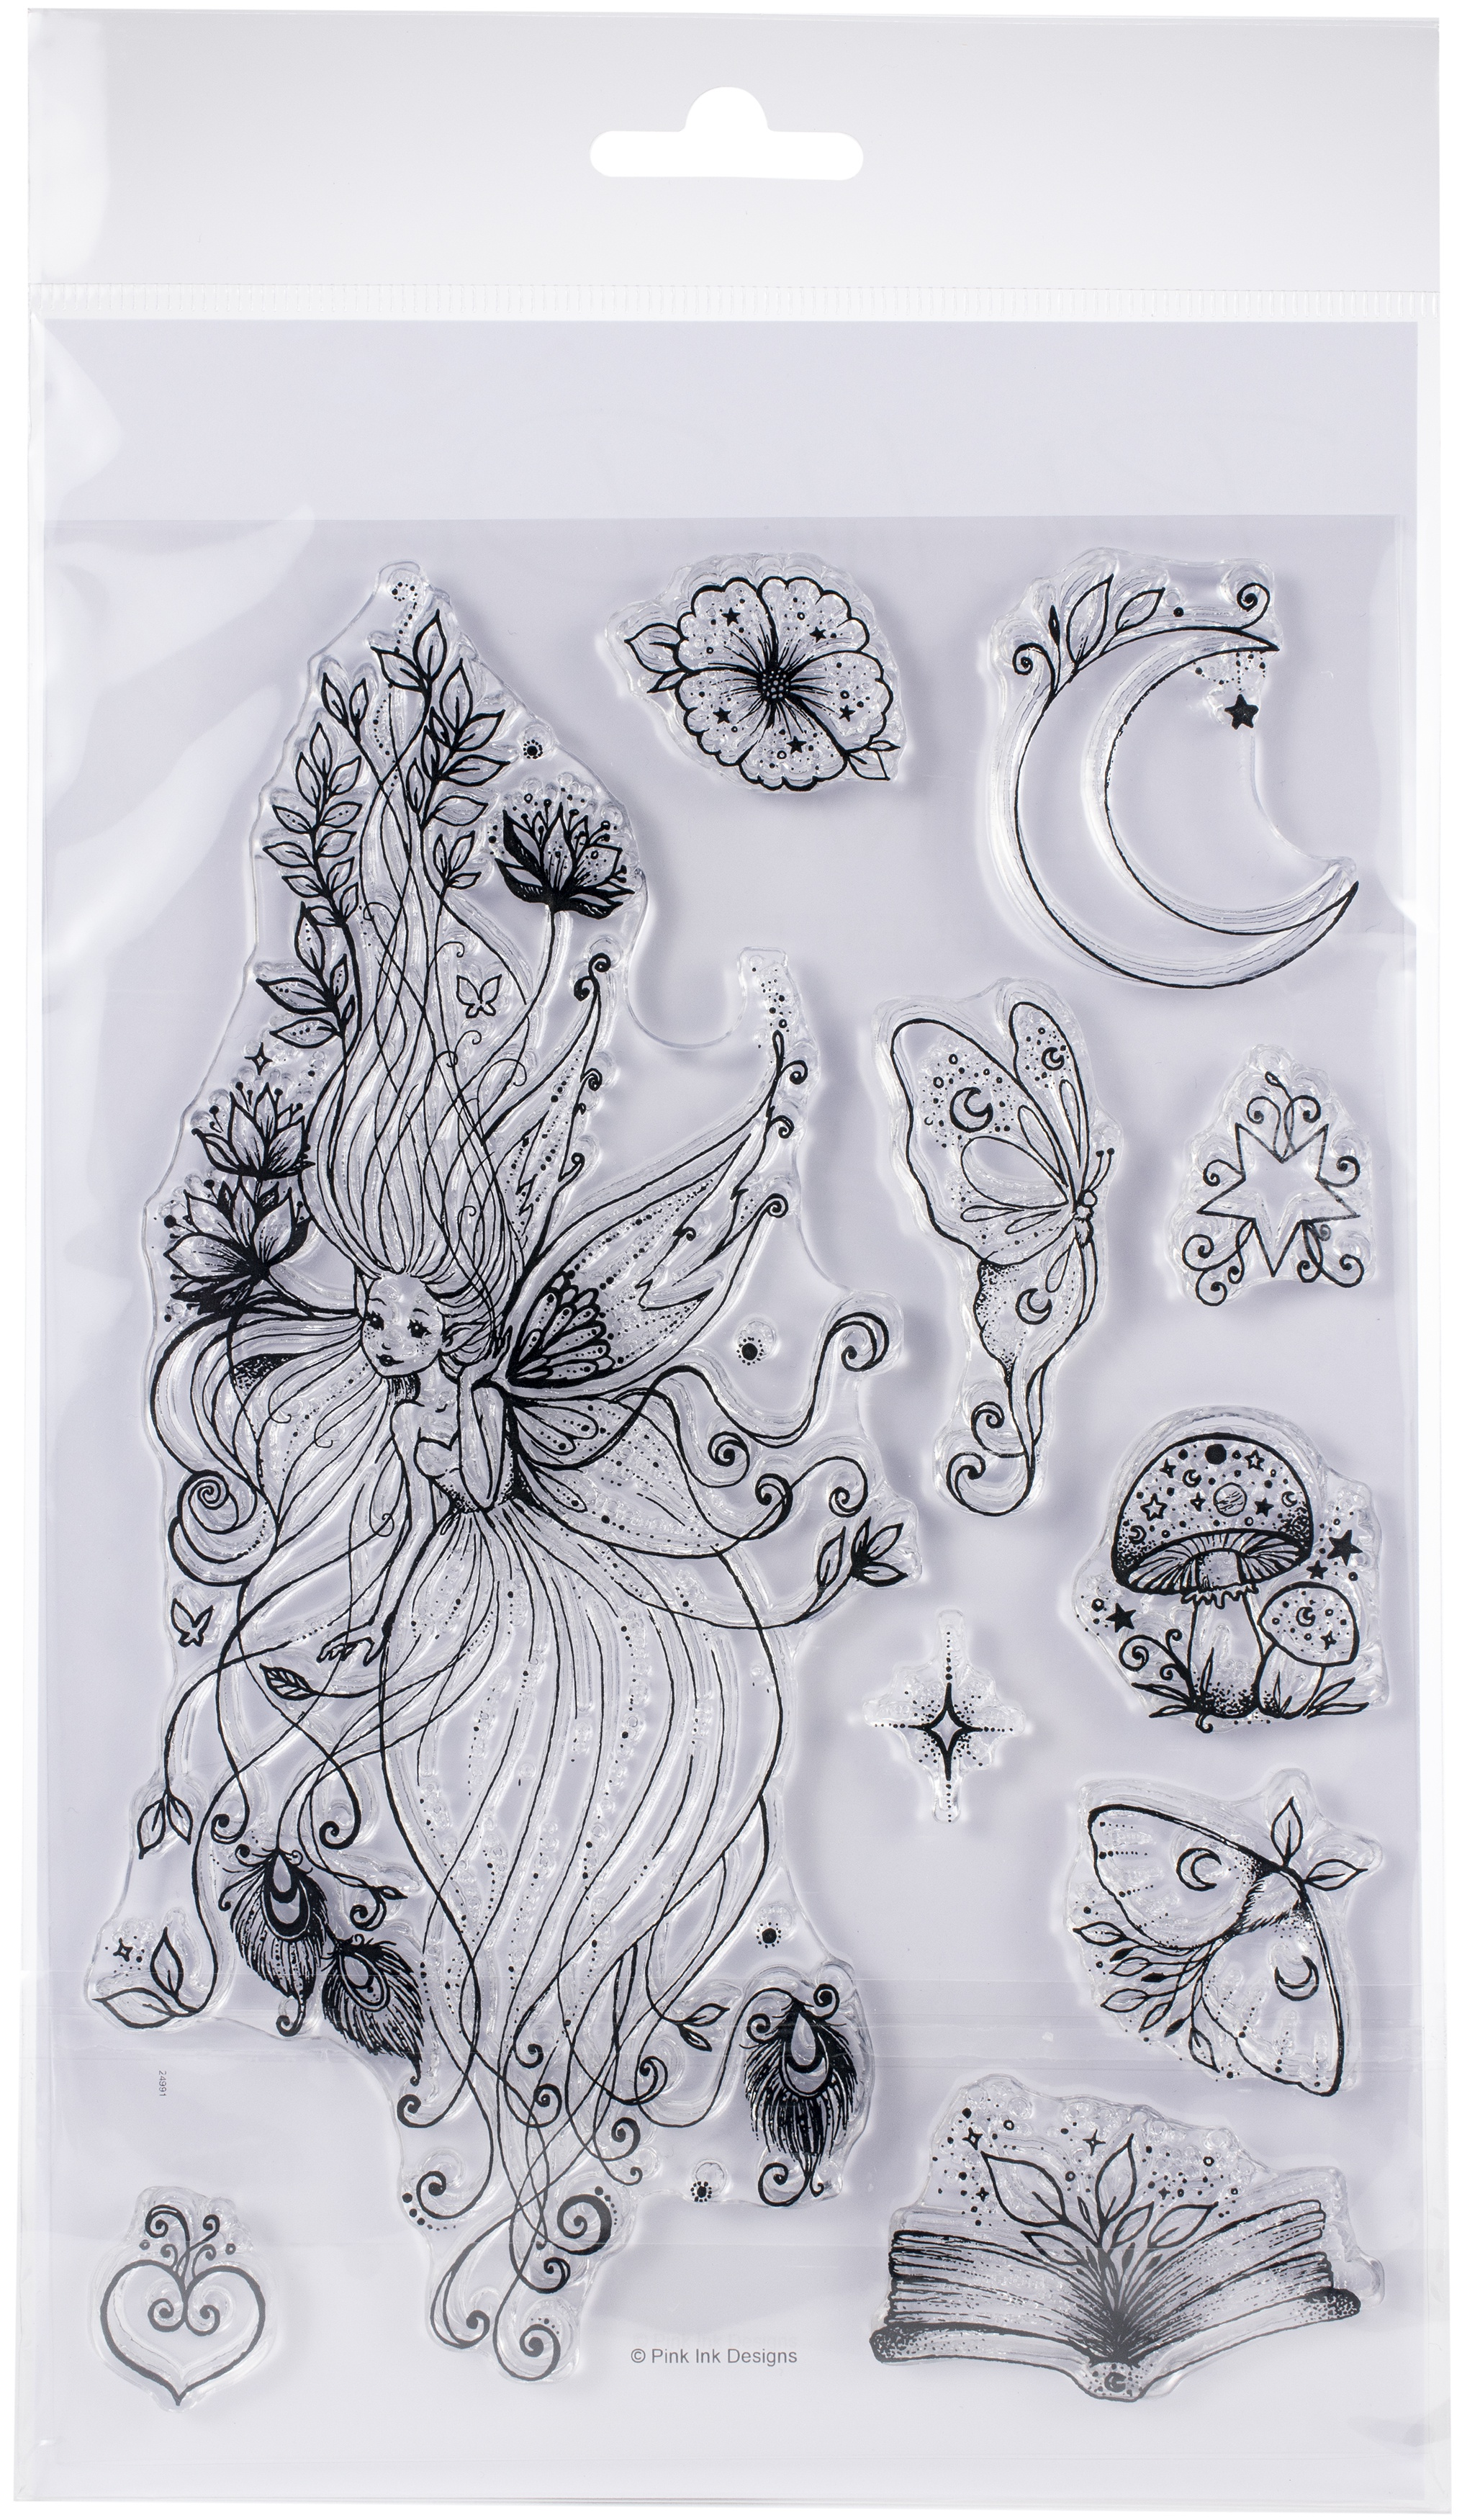 Pink Ink Designs A5 Clear Stamp Set -Luna Fairy